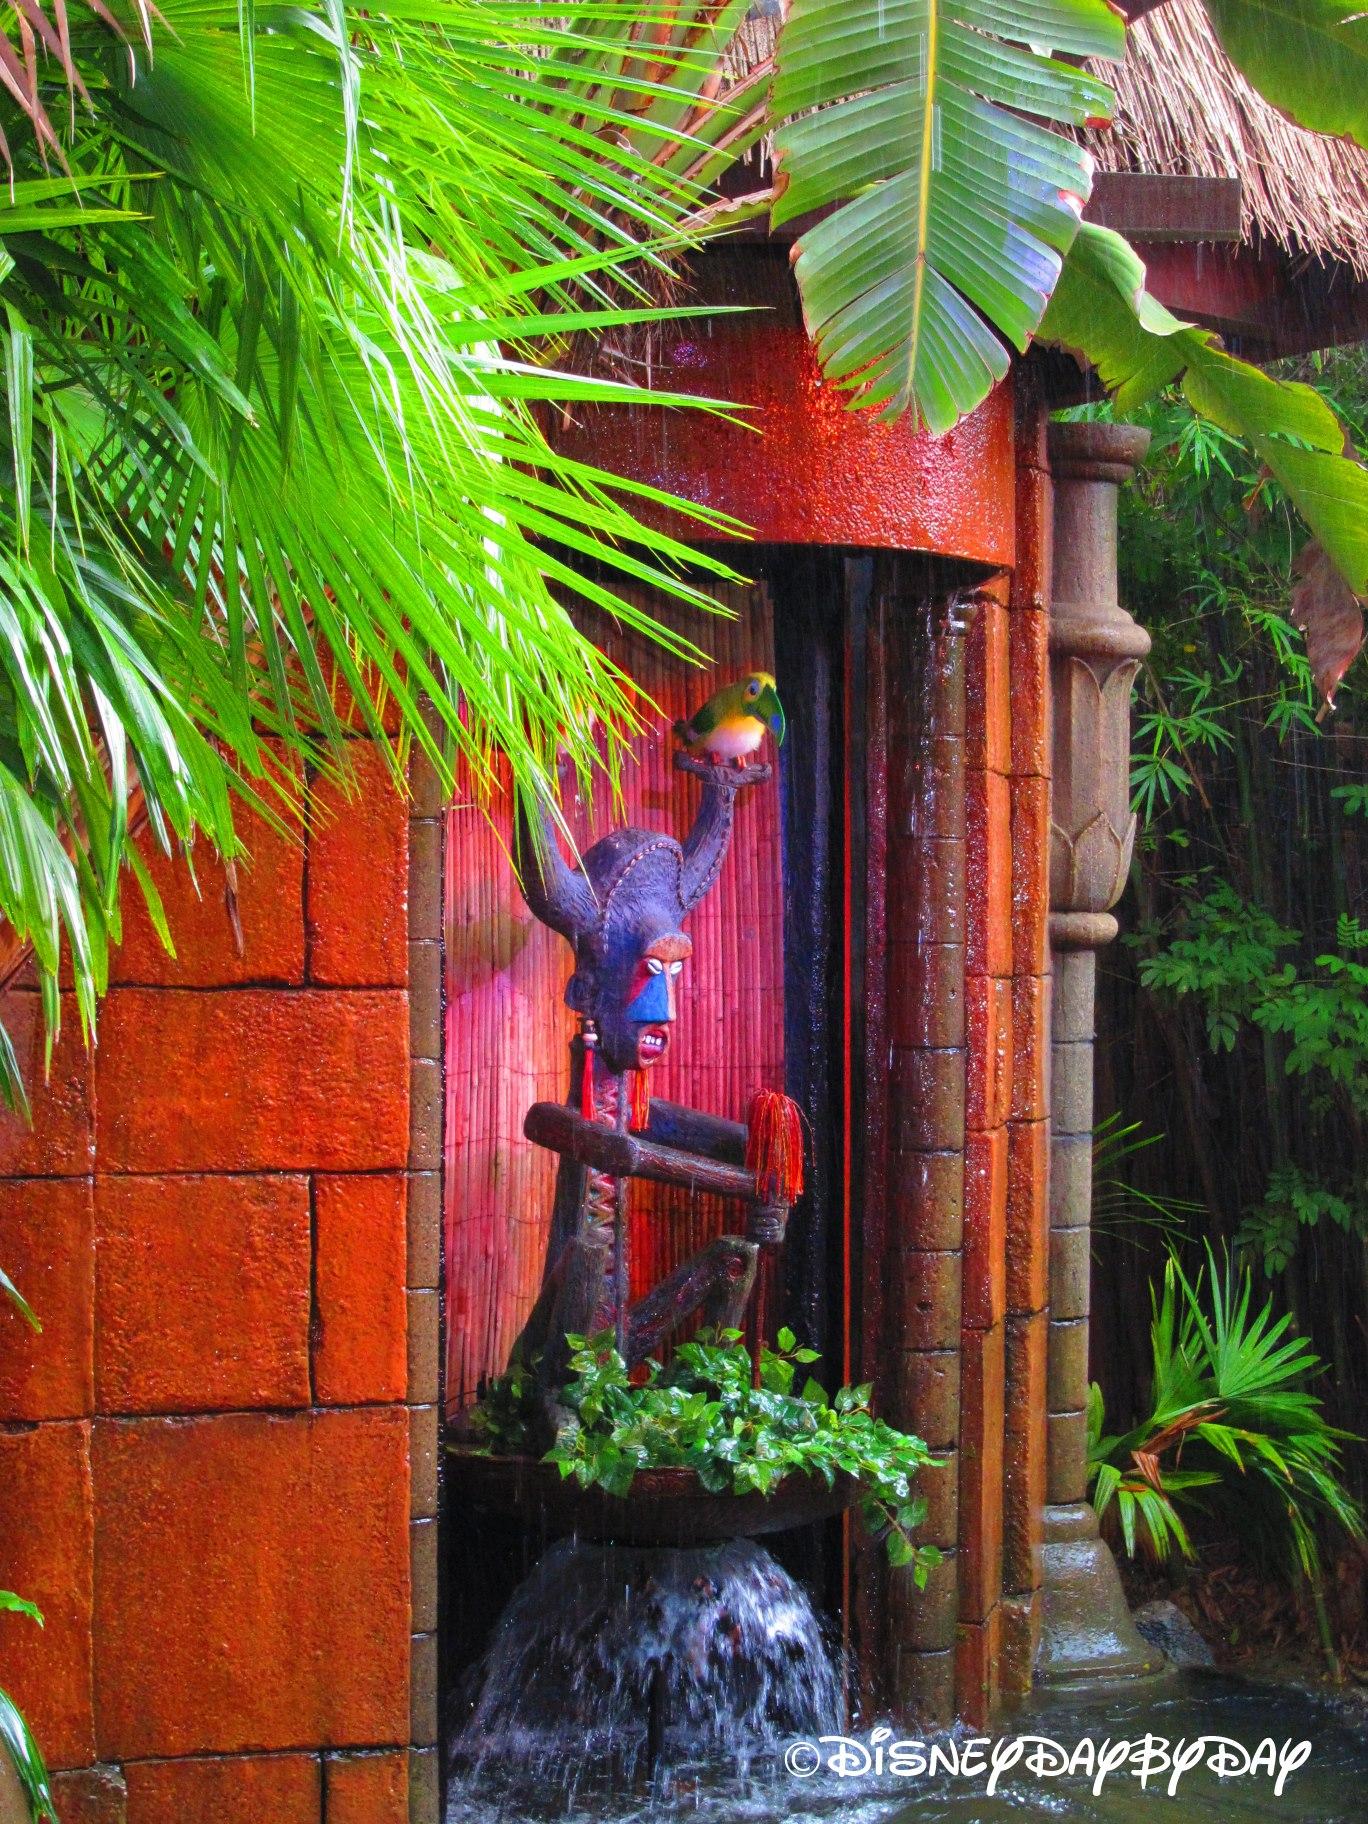 Walt Disneys Enchanted Tiki Room